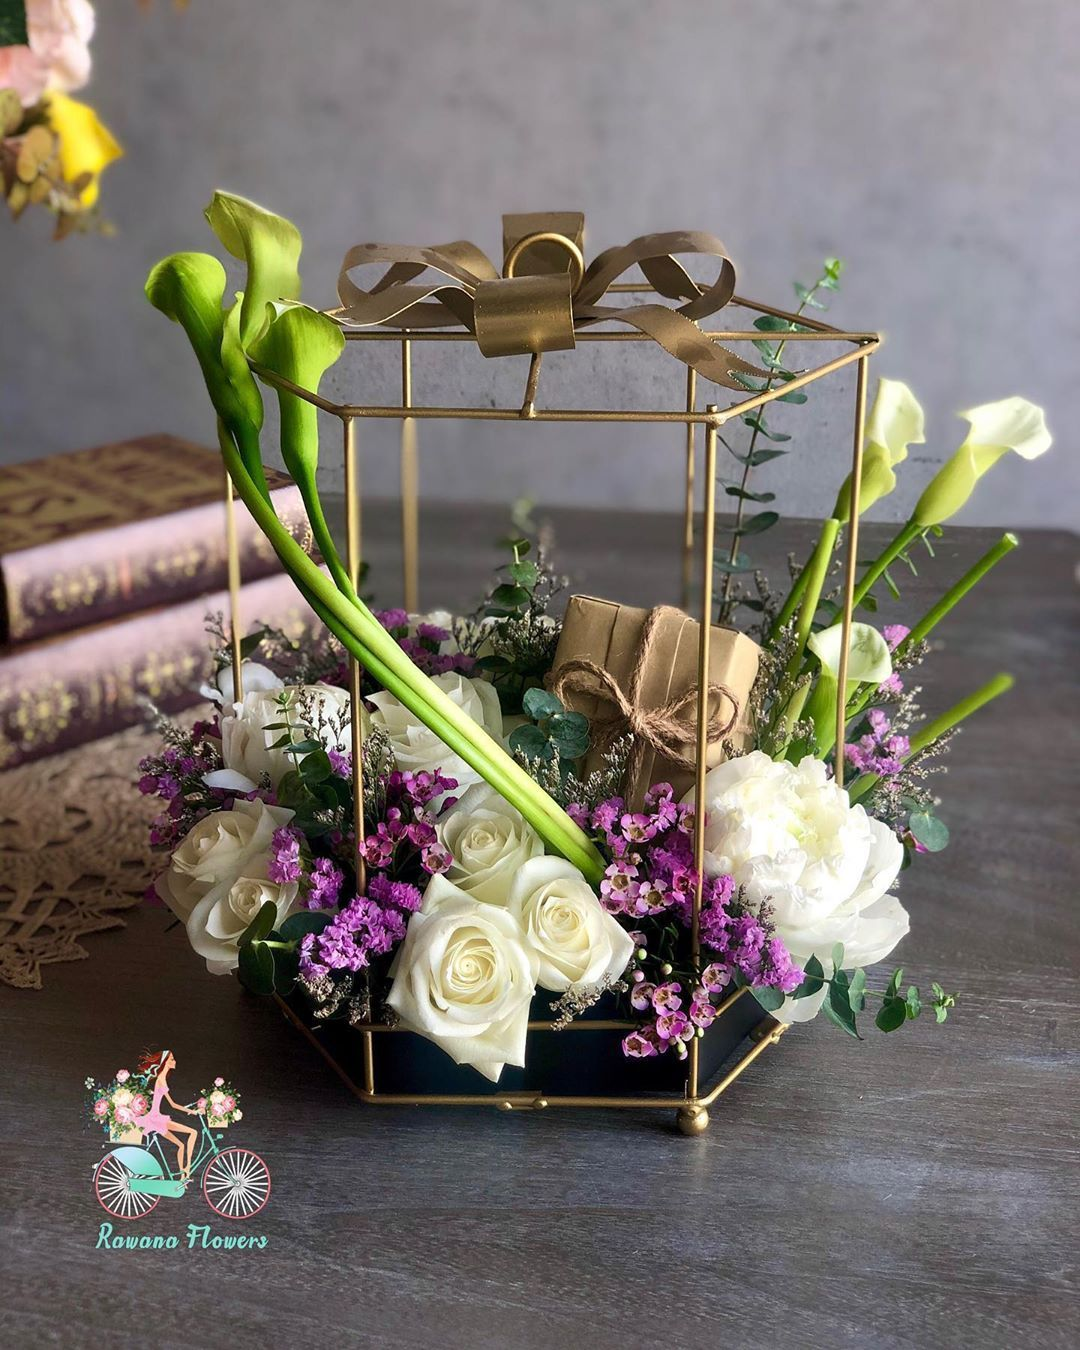 R A W A N A F L O W E R S On Instagram تغليف هدية Rak Rakuae Rasalkhaimah Rasalkhaima راس الخيمة رأس الخي Floral Wreath Gifts Floral